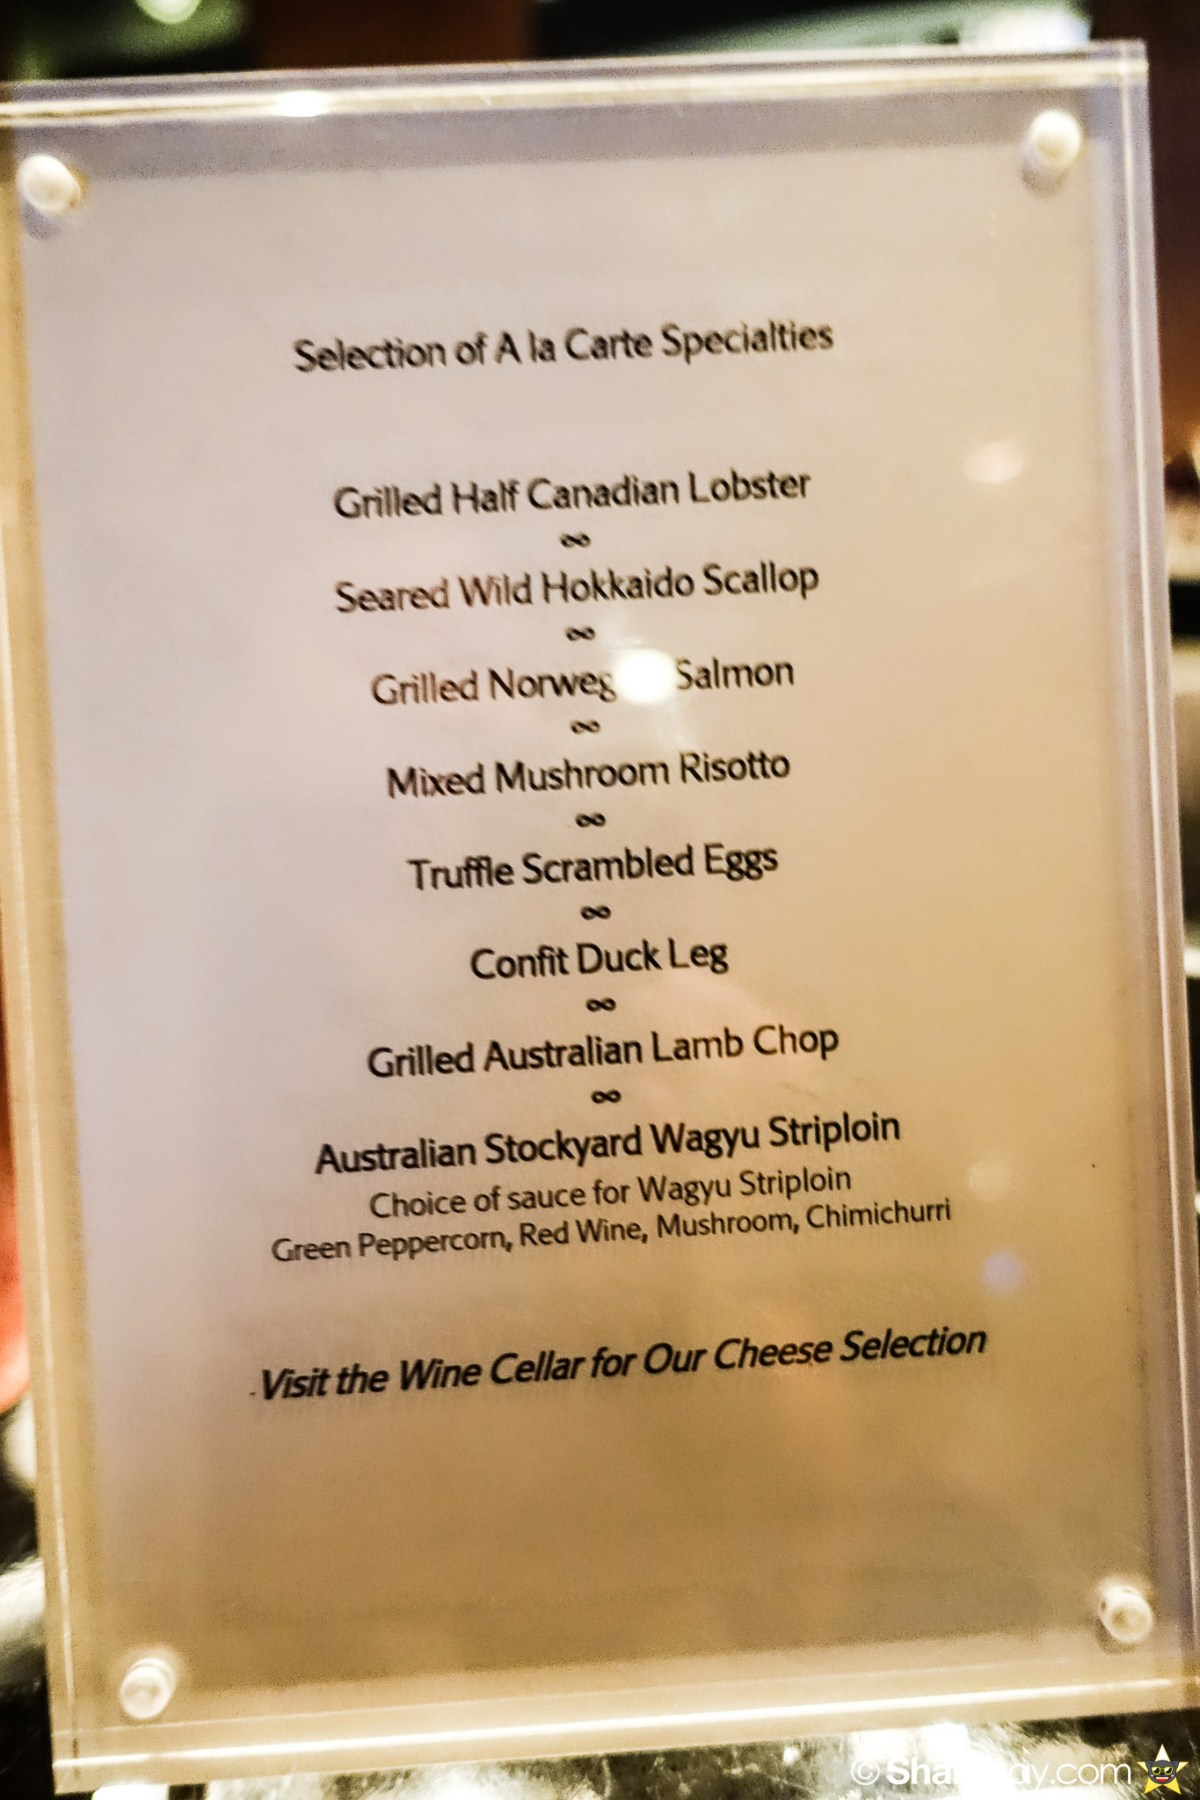 Sunday Brunch Bangkok - Fabulous Brunch Buffet Spread at The District - Ala Carte menu